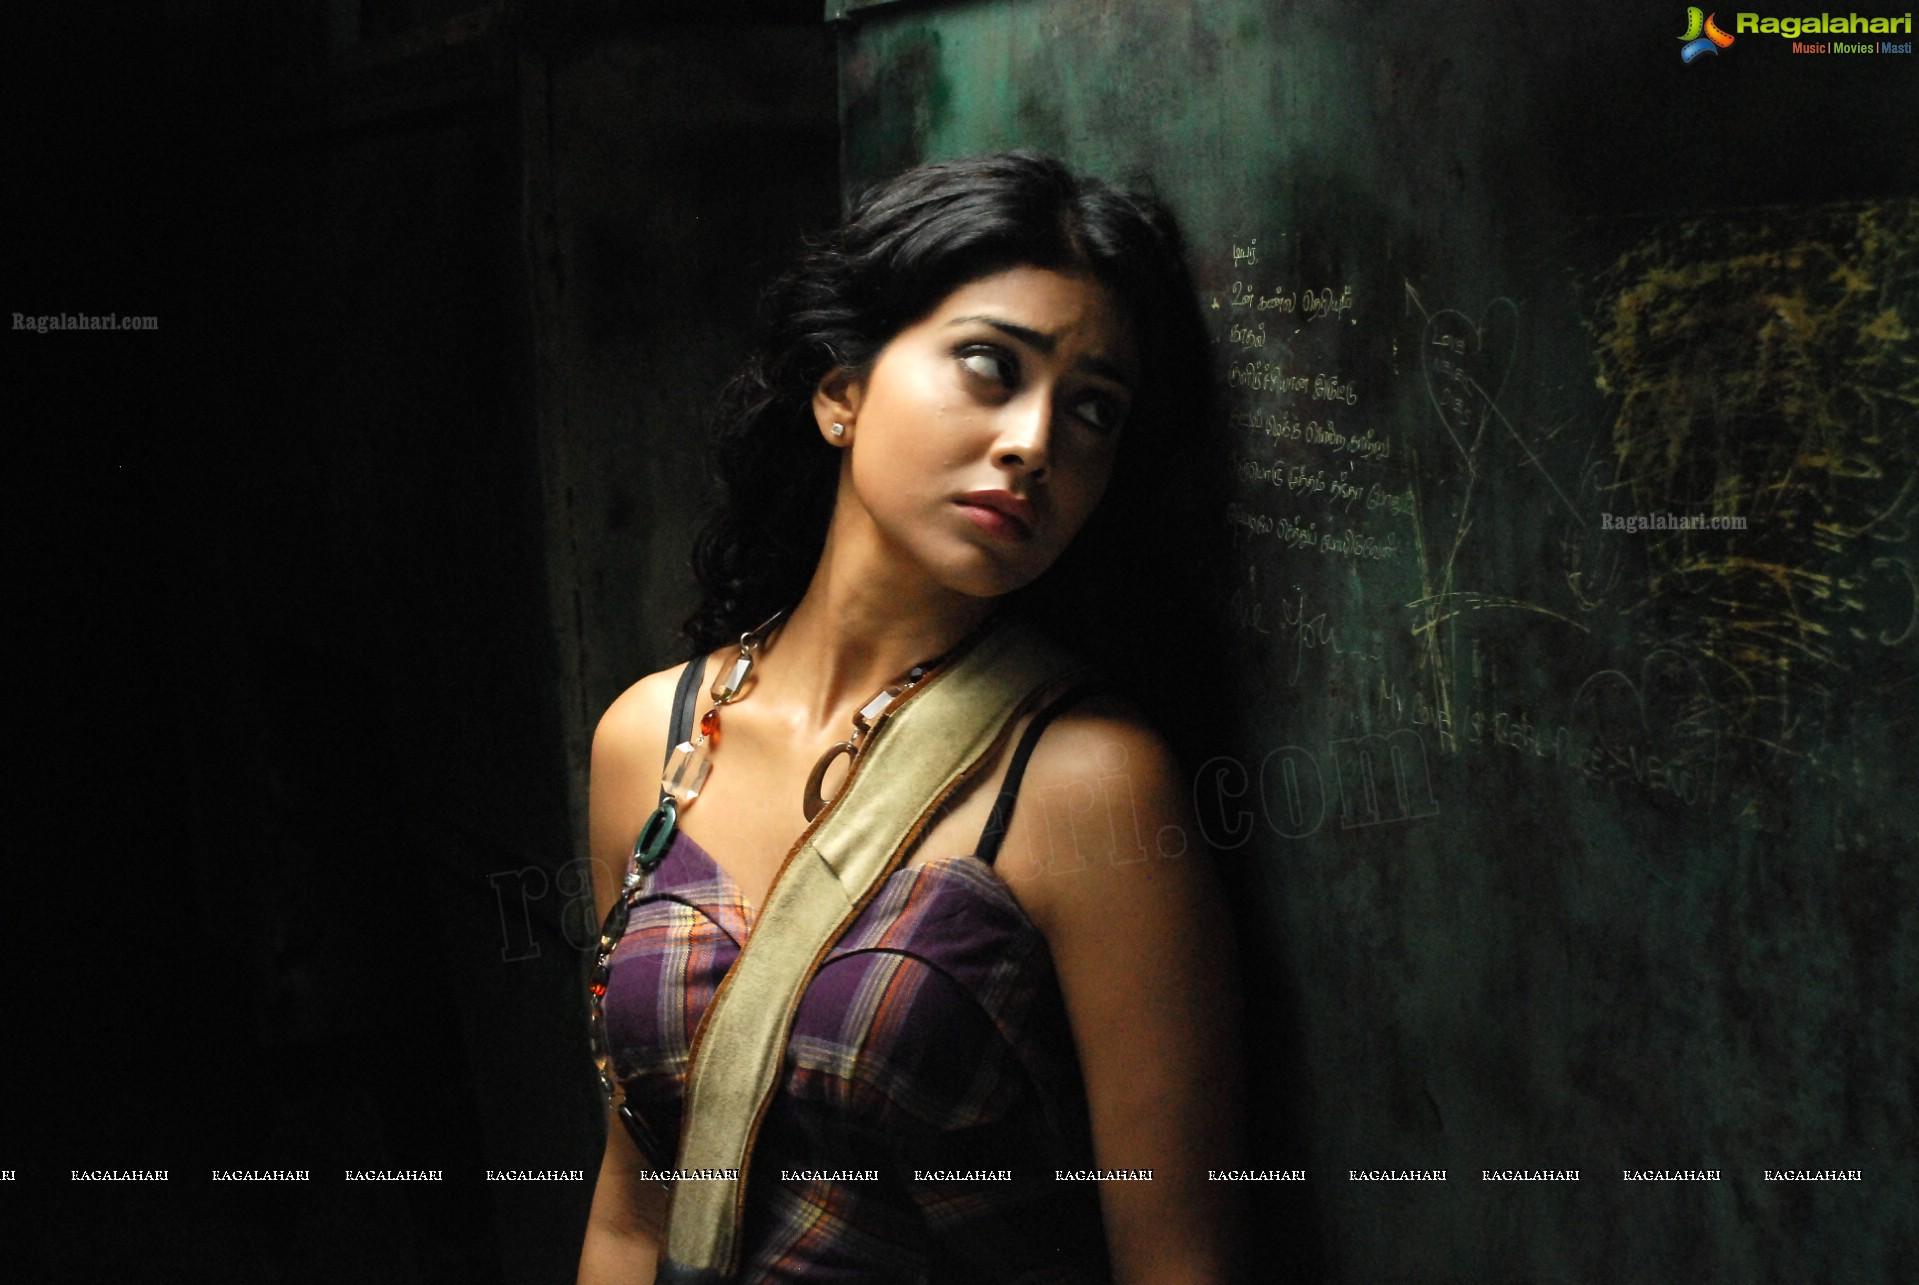 Shriya Saran Hd Image 1 Telugu Actress Stillsimages Photos Wallpapers Stills Posters